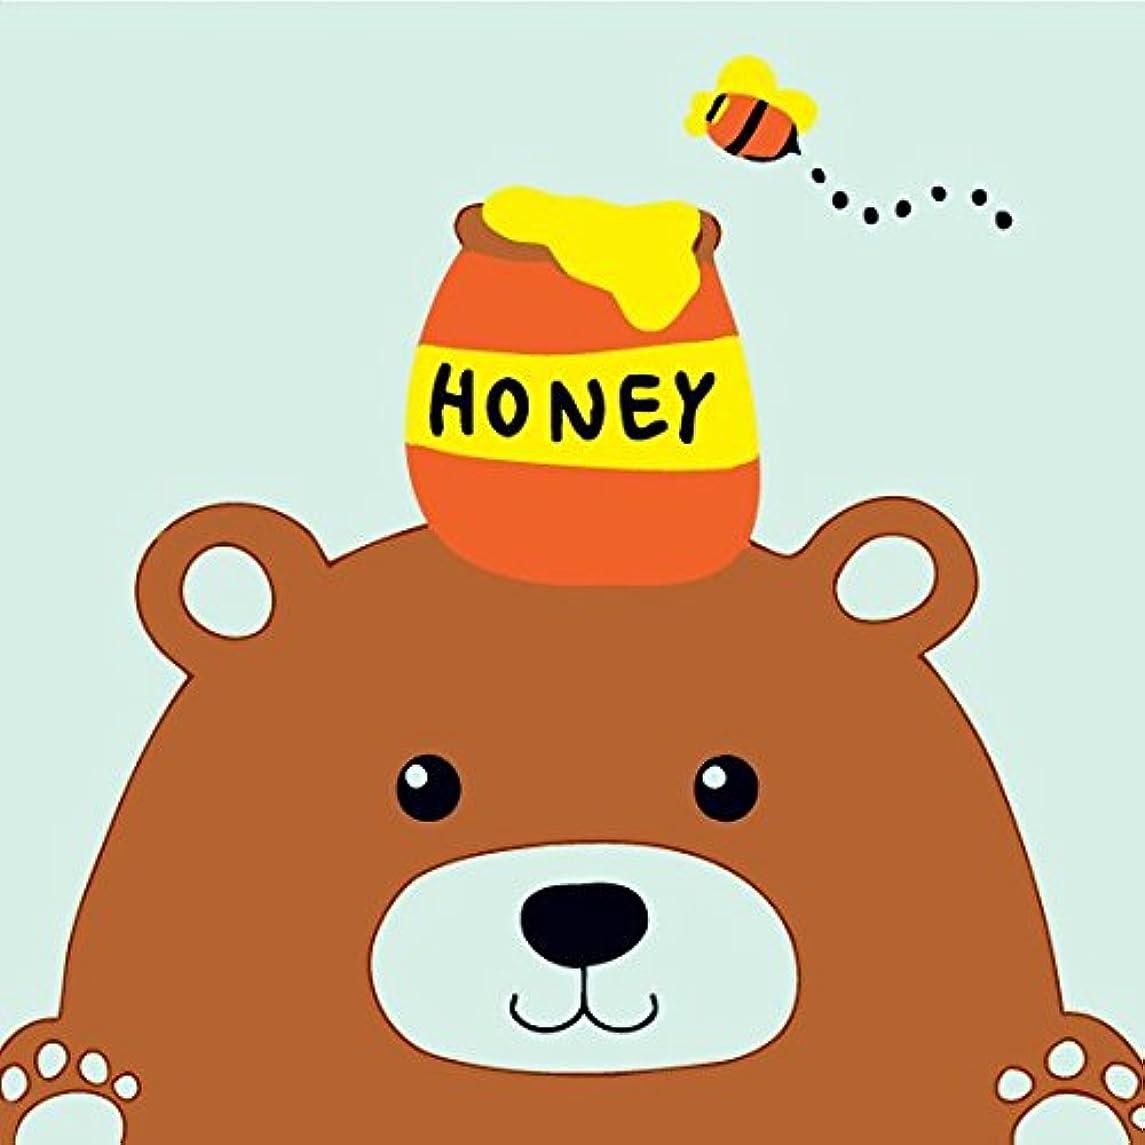 Dorara DIY Oil Painting, Paint By Number Kits for Kids Honey Bear 8